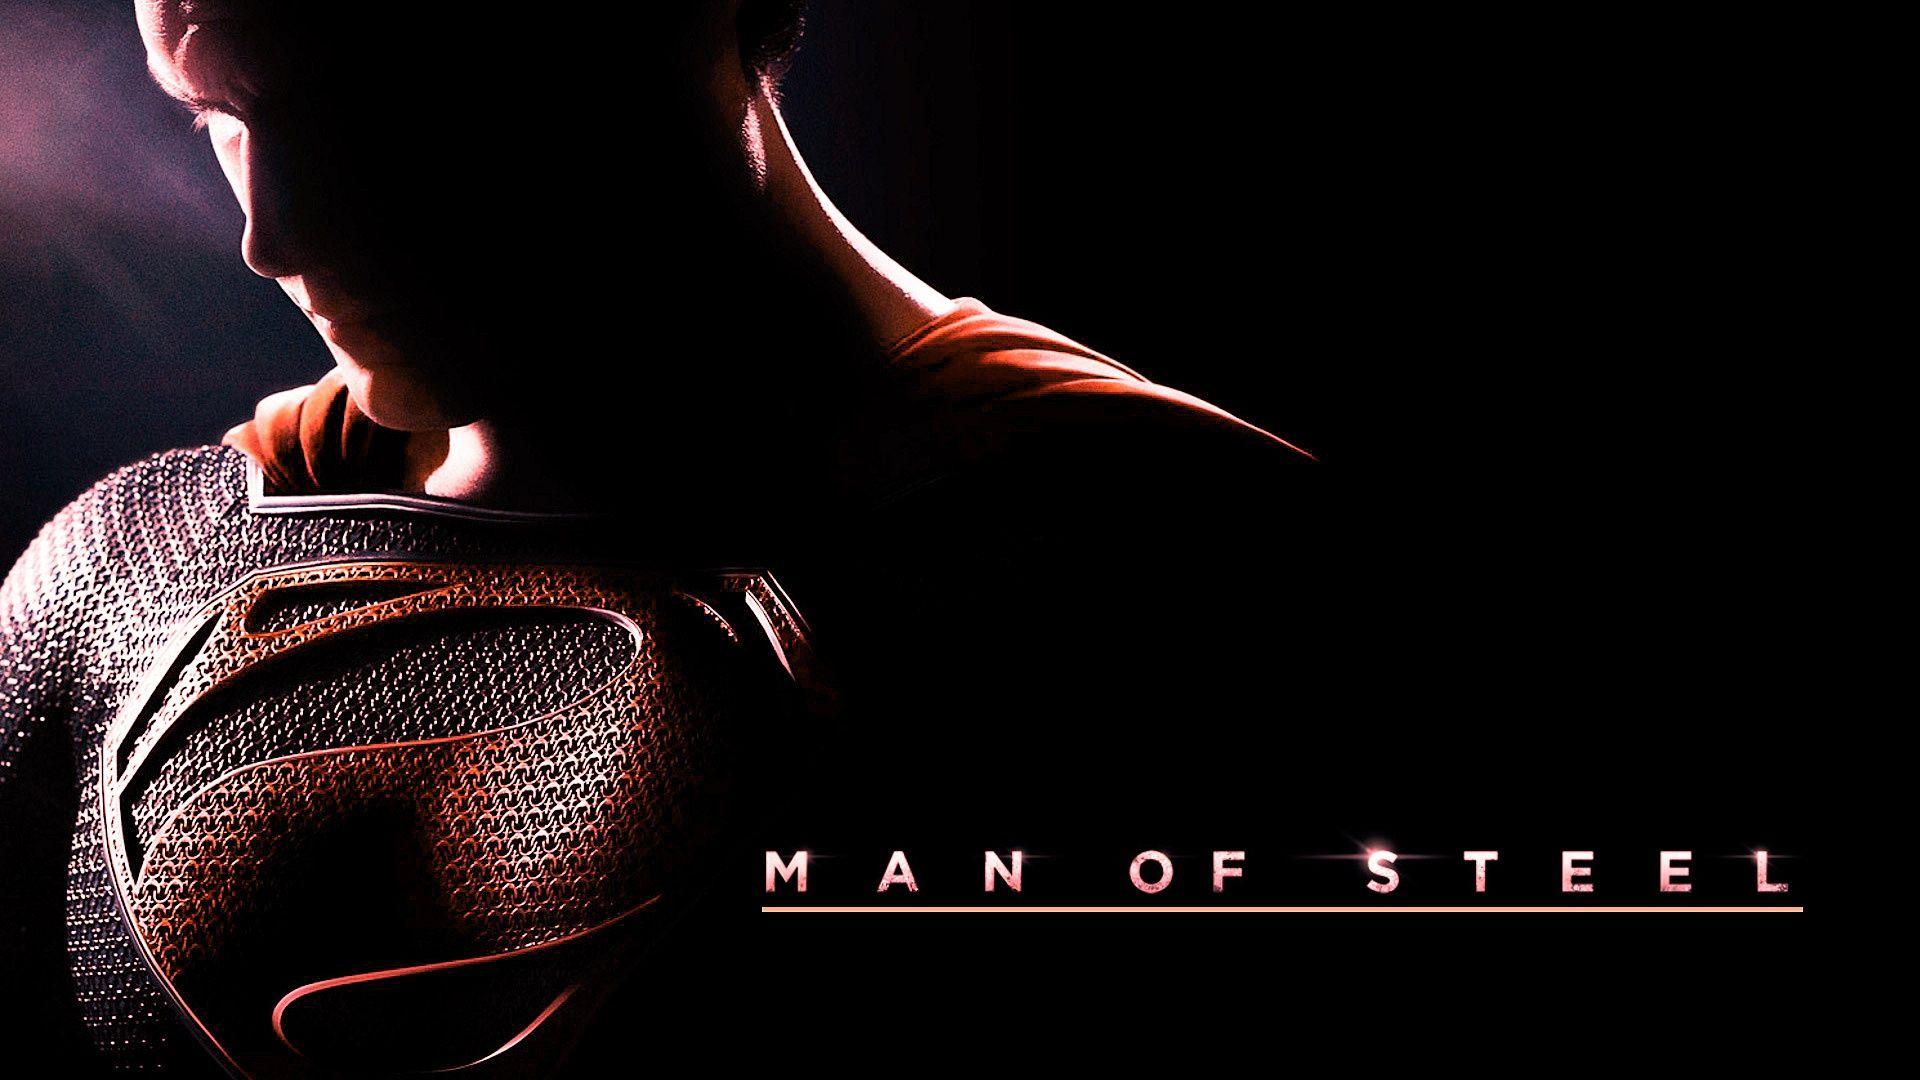 Superman laser vision man of steel clipart picture transparent Man of steel hd clipart 1080p - ClipartFox picture transparent